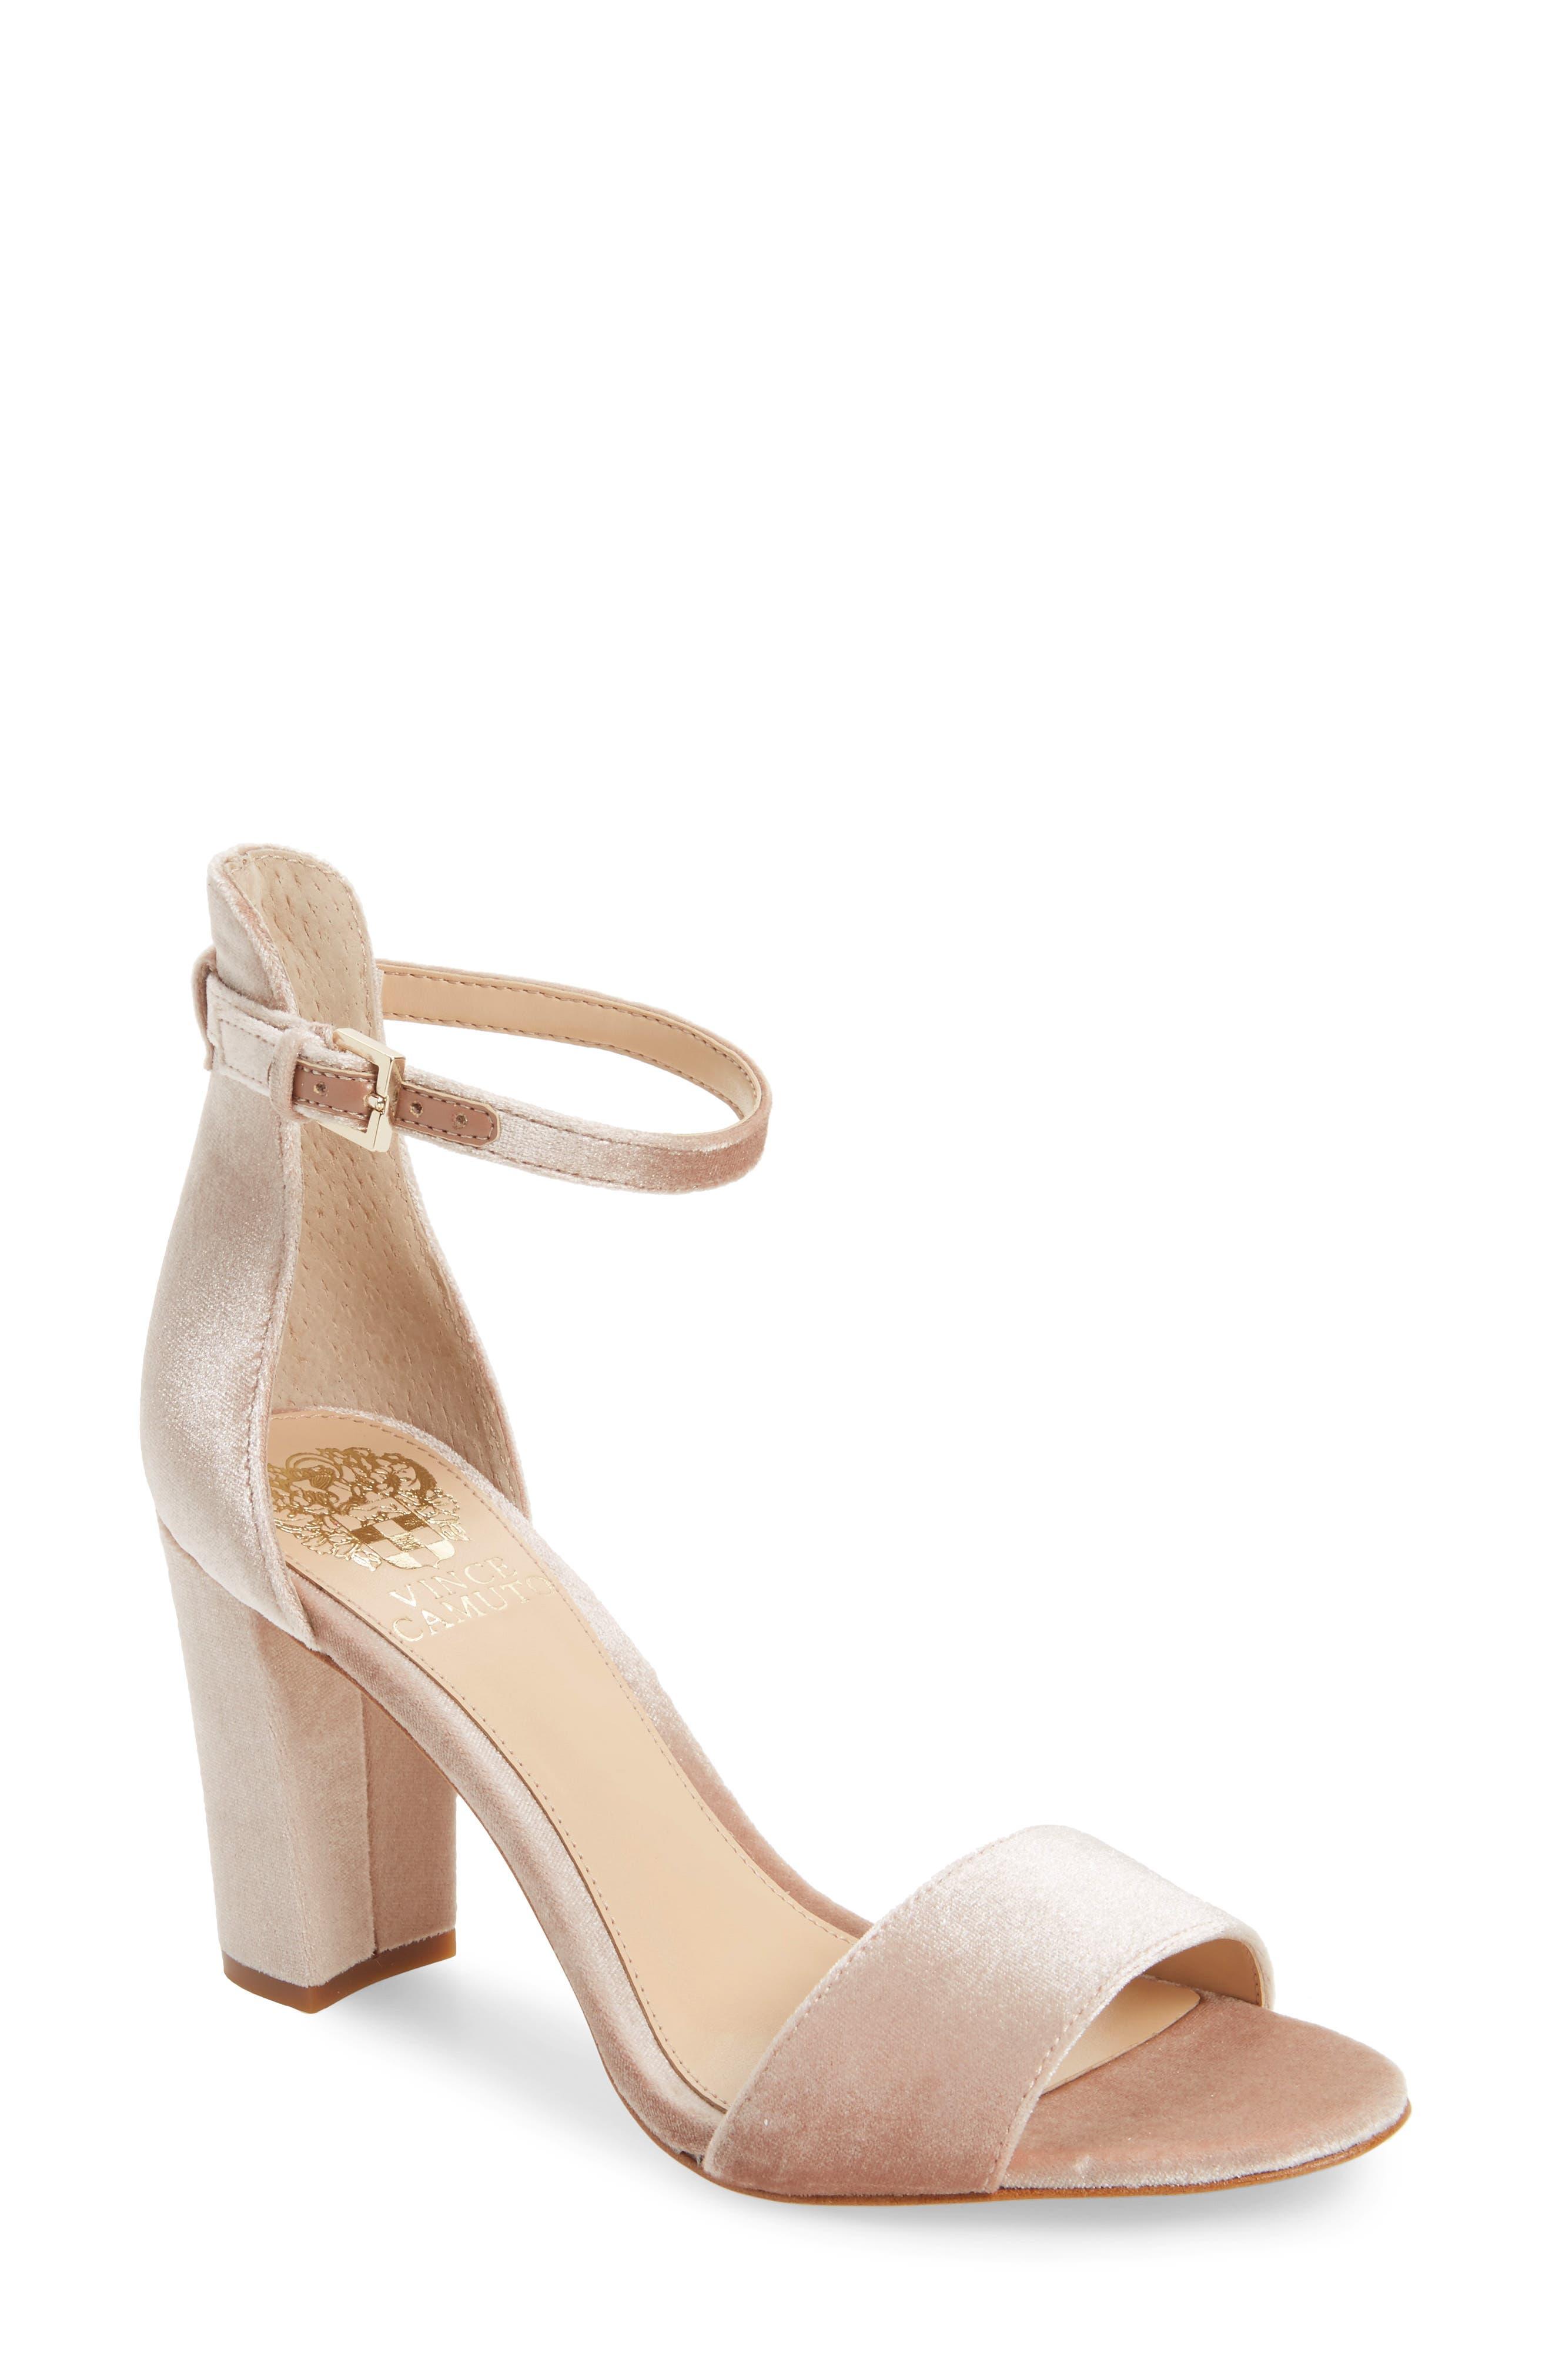 Womens High Heel Shoes Y8xfqhFL